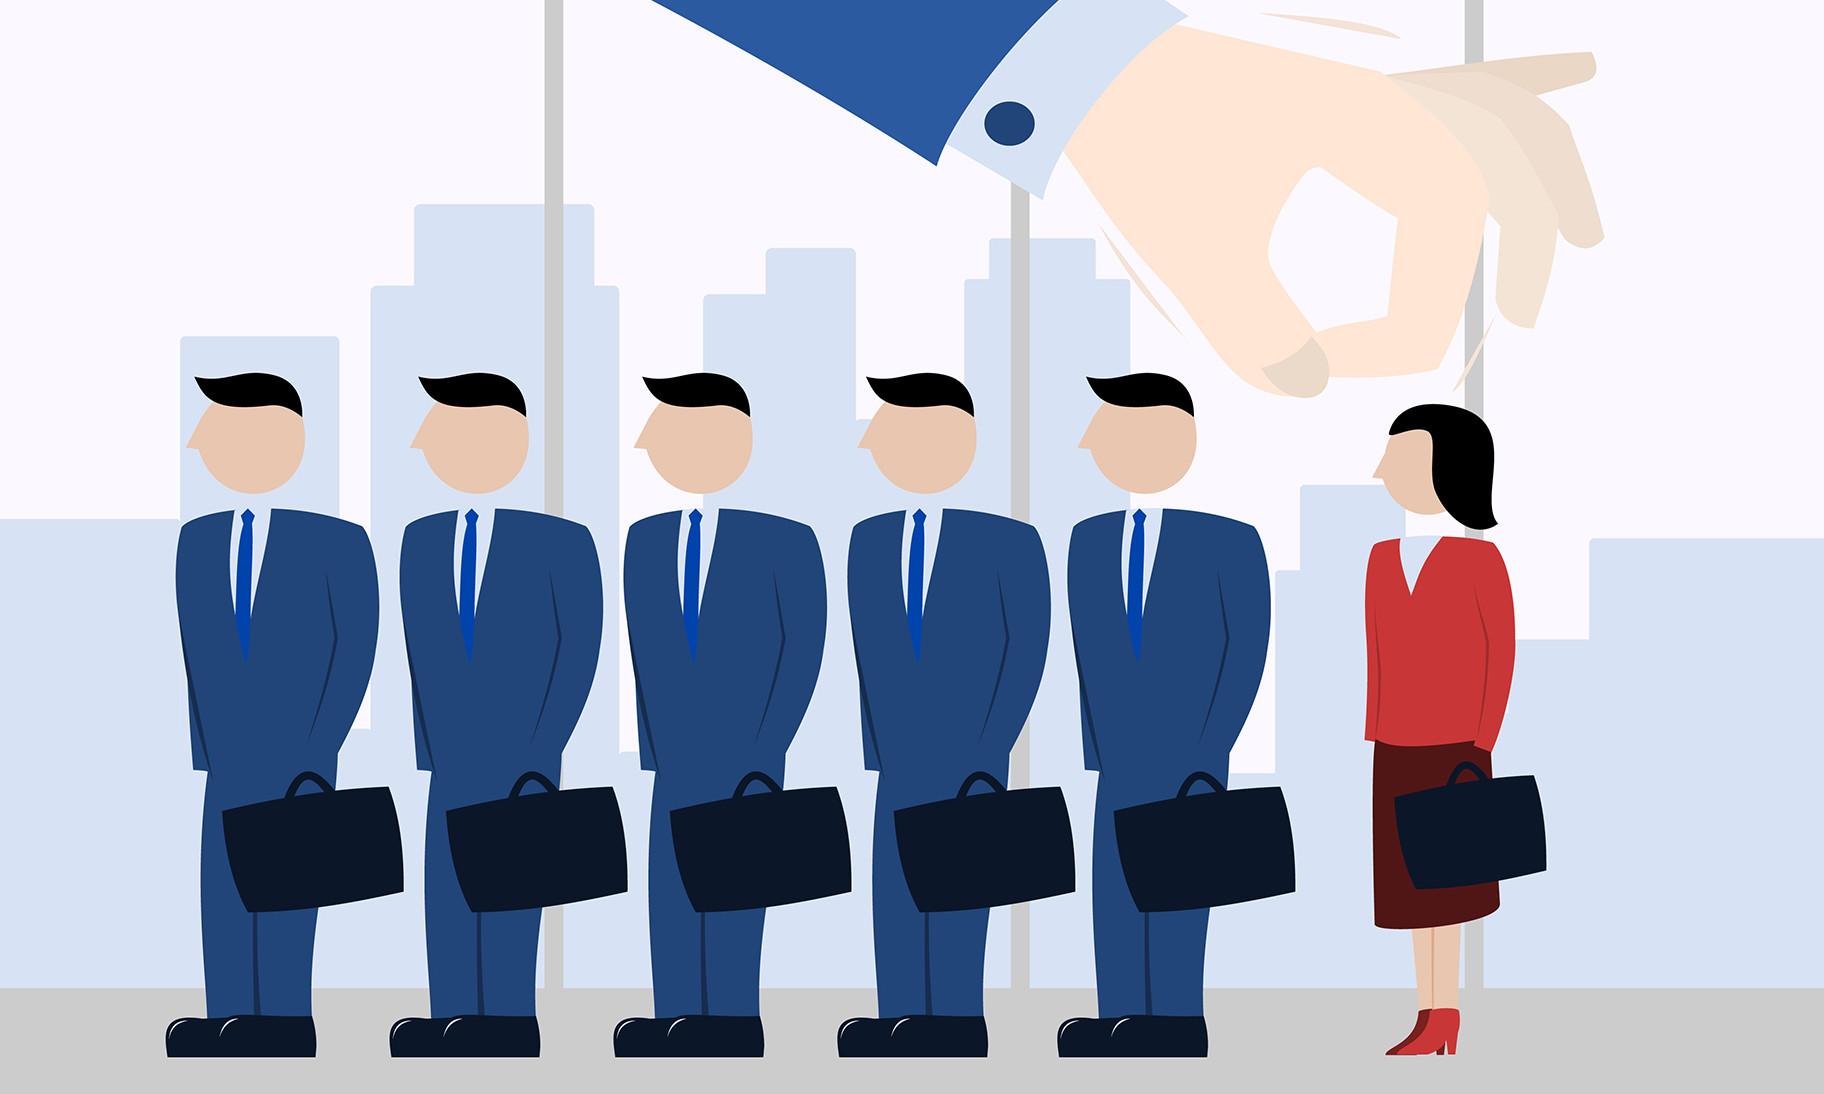 gender discrimination towards women in the workplace